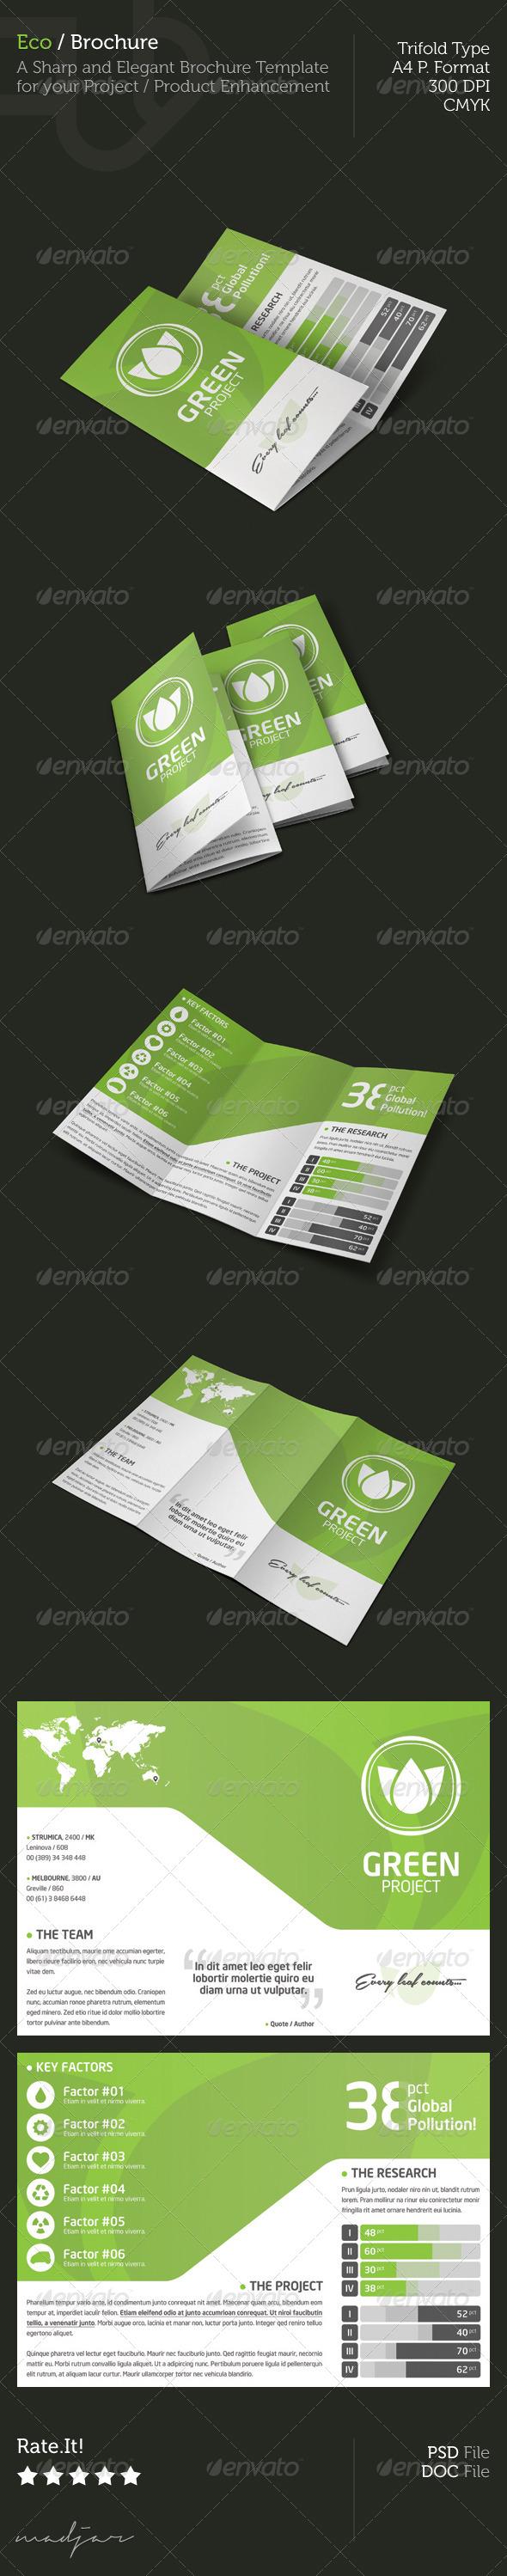 Eco - Trifold Brochure - Brochures Print Templates